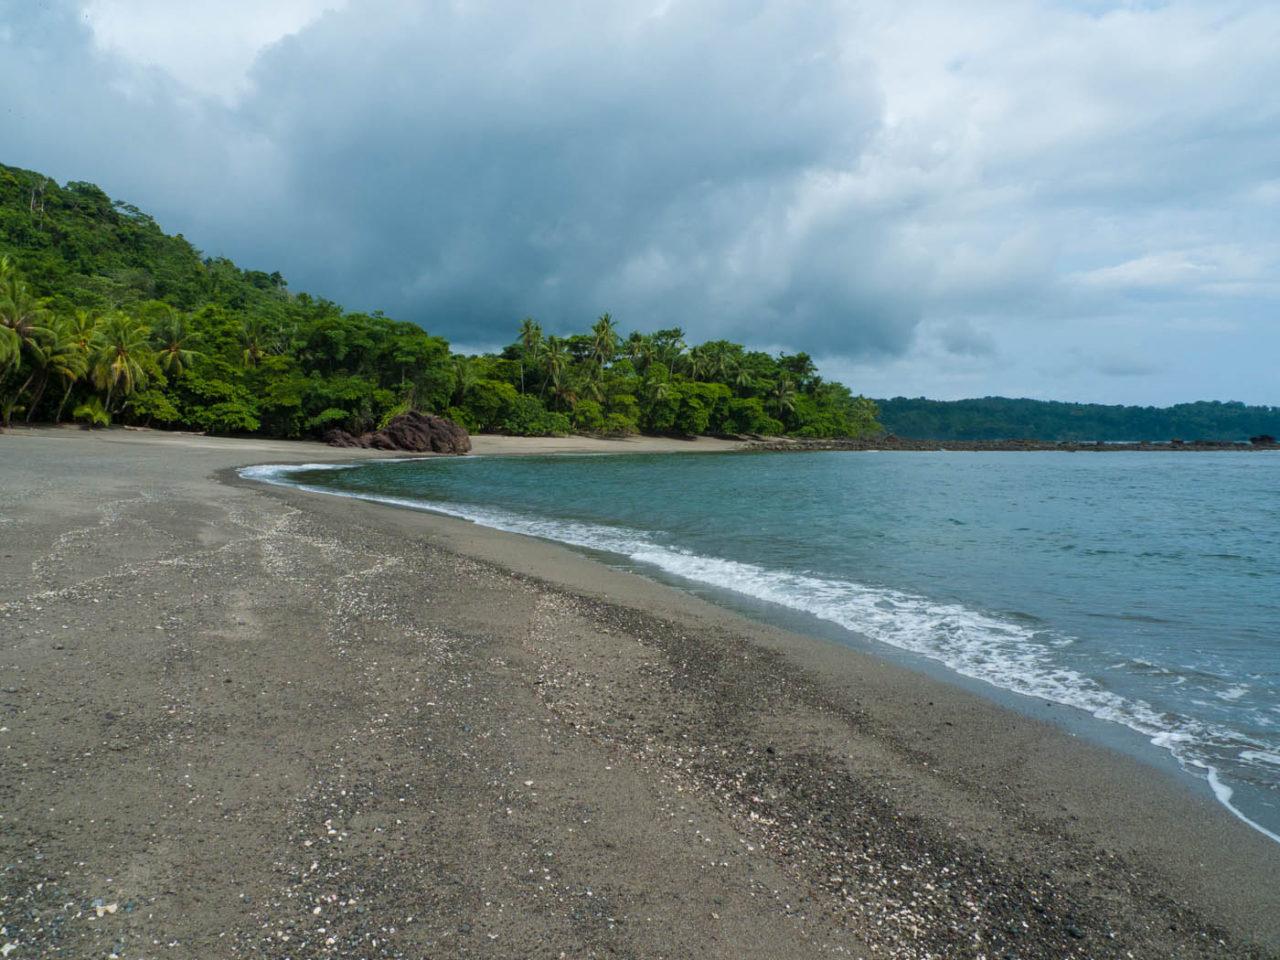 deserted beach made of seashells and rocks Osa Peninsula Costa Rica